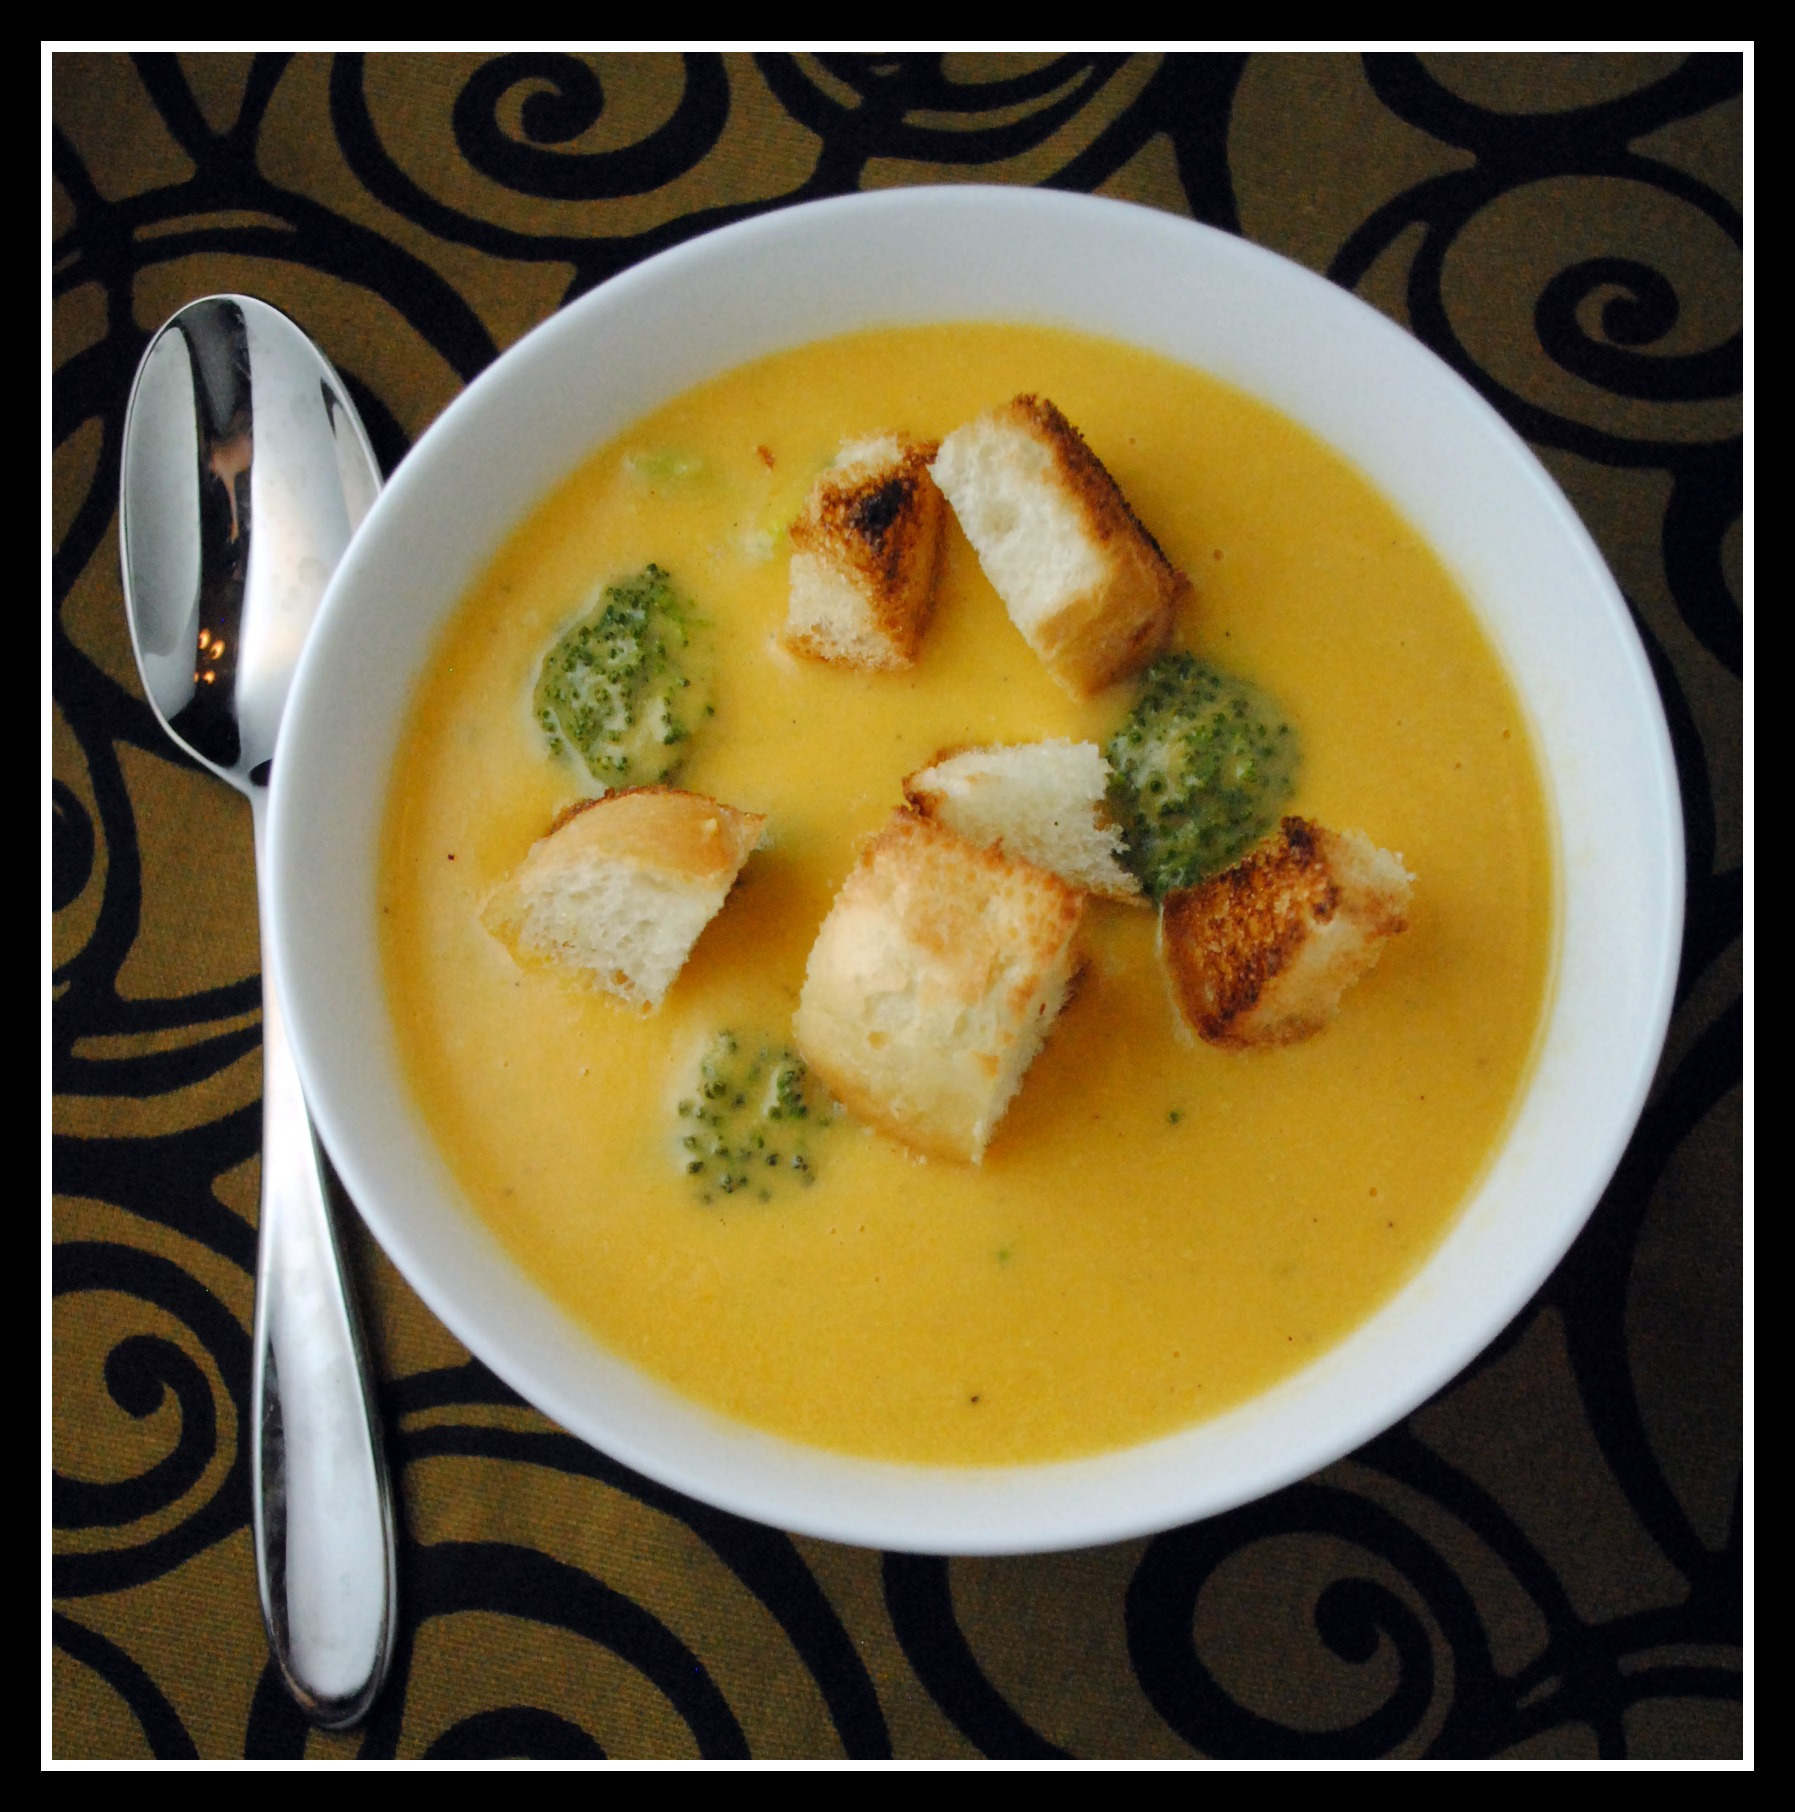 Broccoli-Cheddar Soup + Weekly Menu